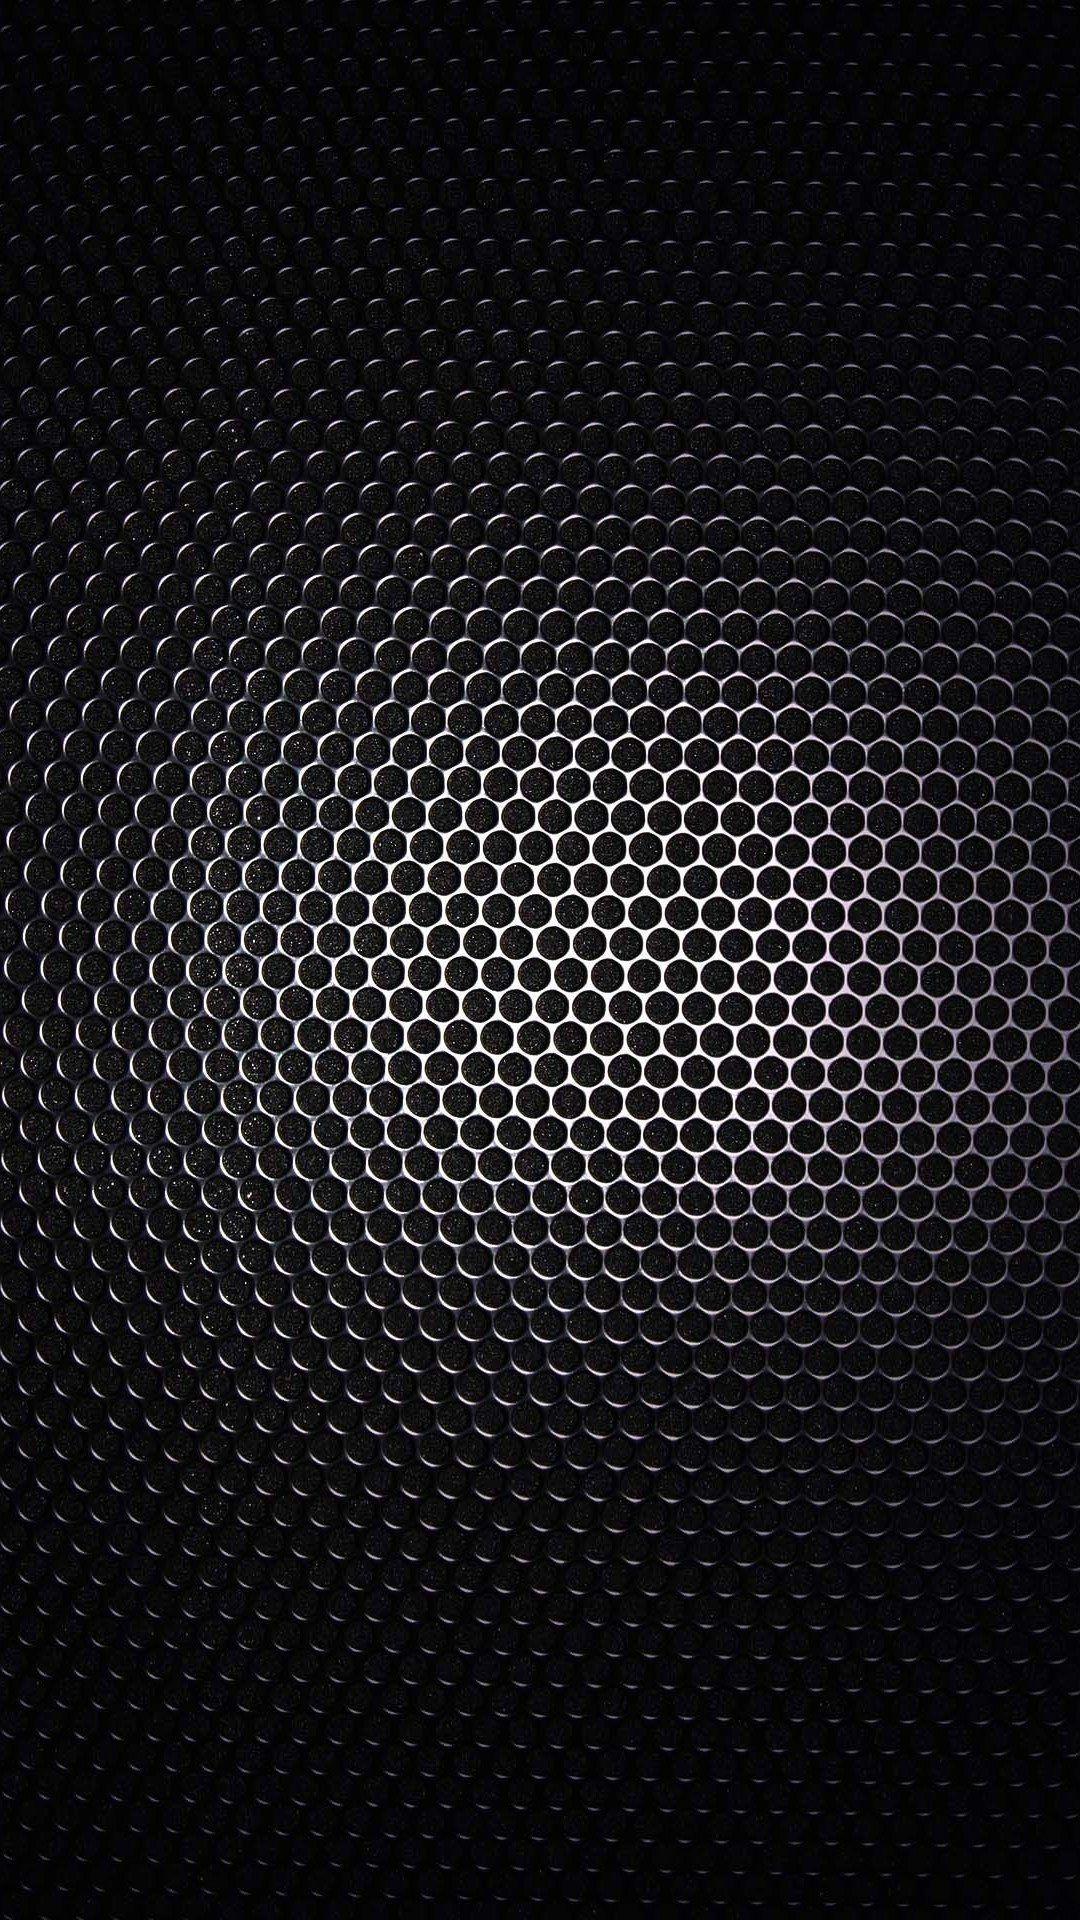 Wallpaper full hd x smartphone audi logo x hd wallpapers wallpaper full hd x smartphone audi logo x voltagebd Choice Image